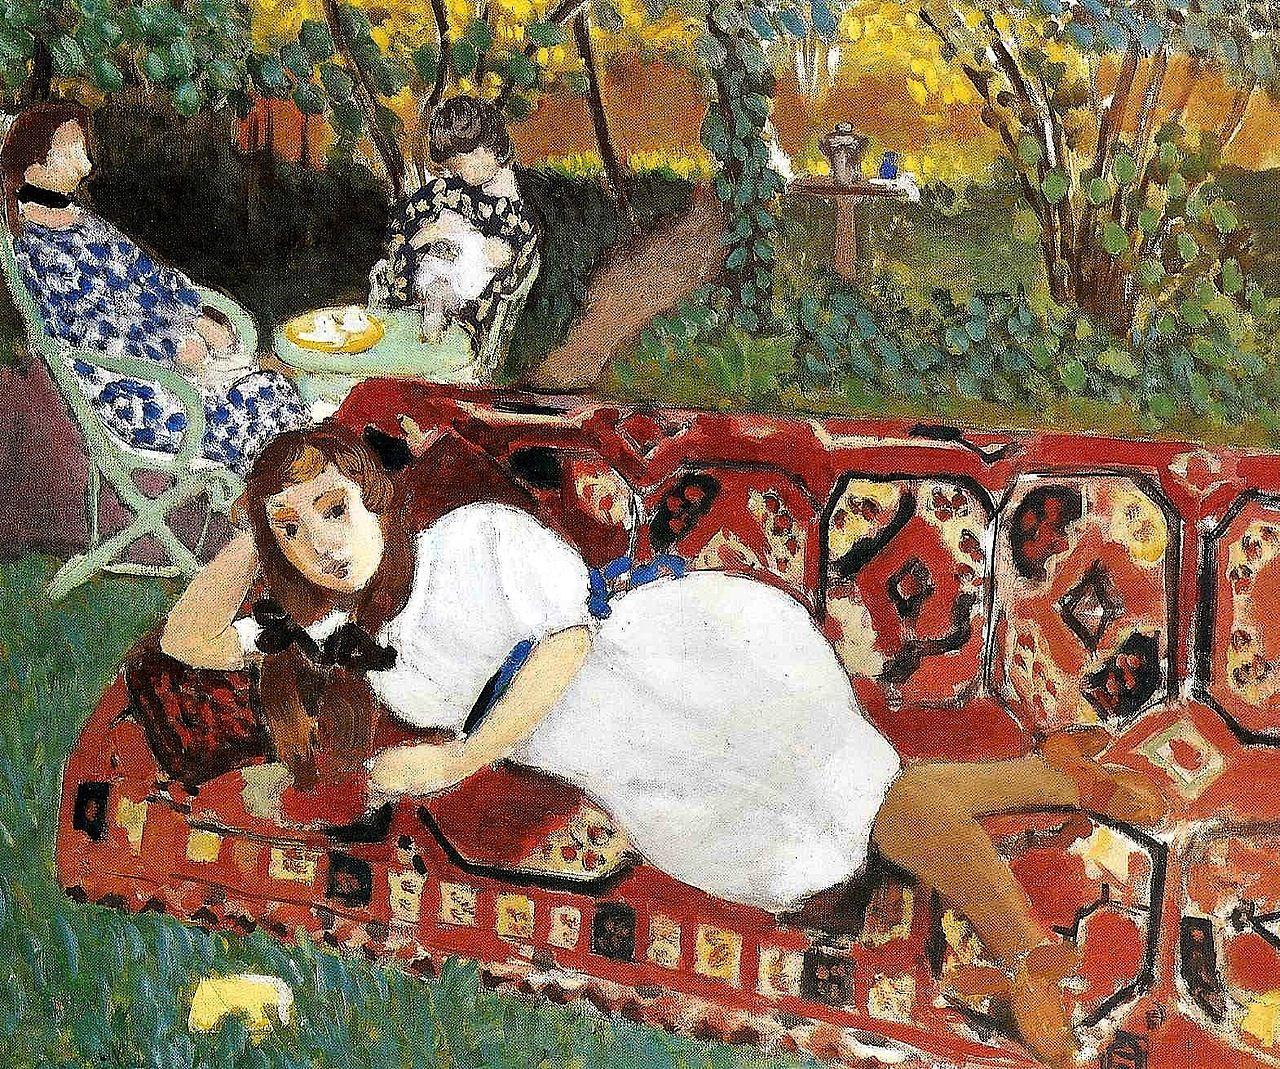 Henri Matisse - Young Women in the Garden | Henri Matisse ...